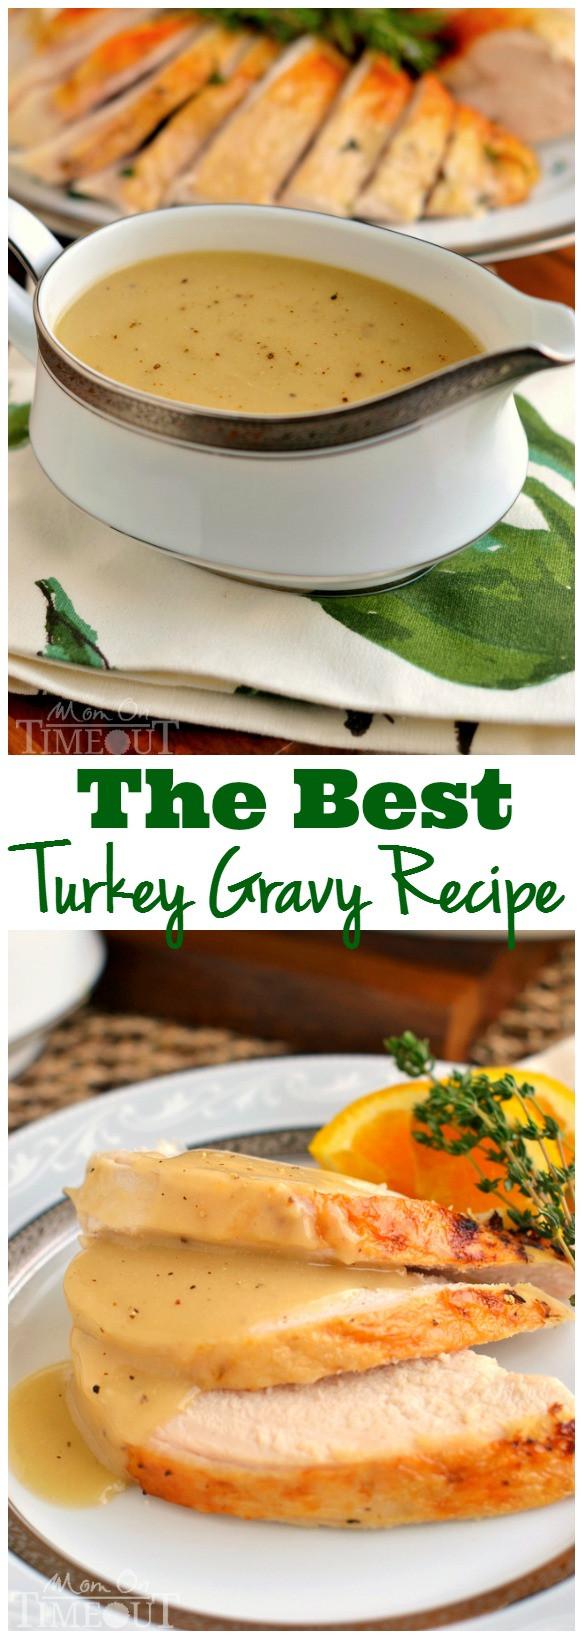 Thanksgiving Gravy Recipe  Rich And Silky Turkey Gravy Recipe — Dishmaps